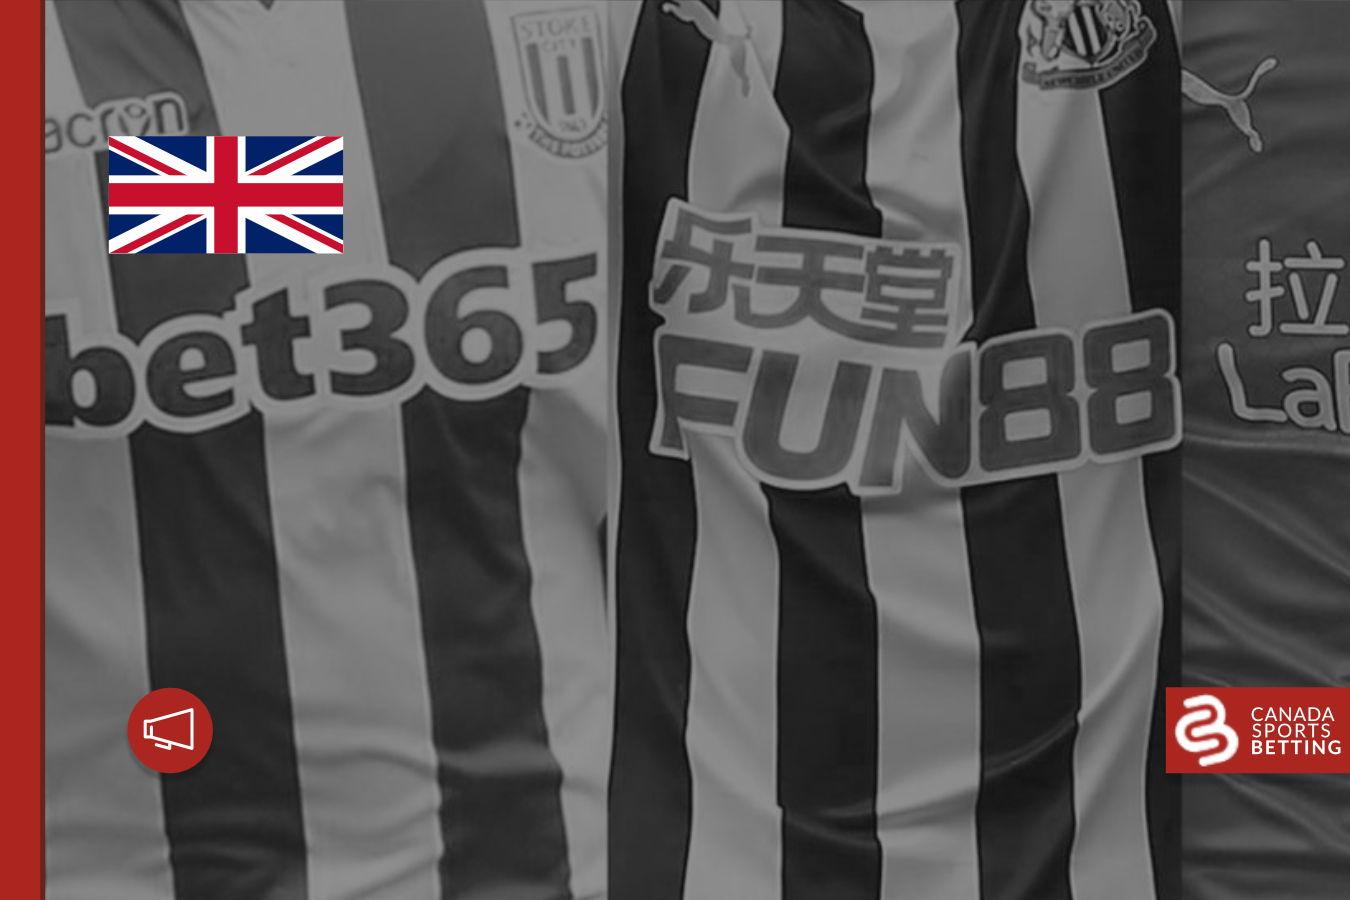 The UK to ban gambling sponsorship on soccer tops